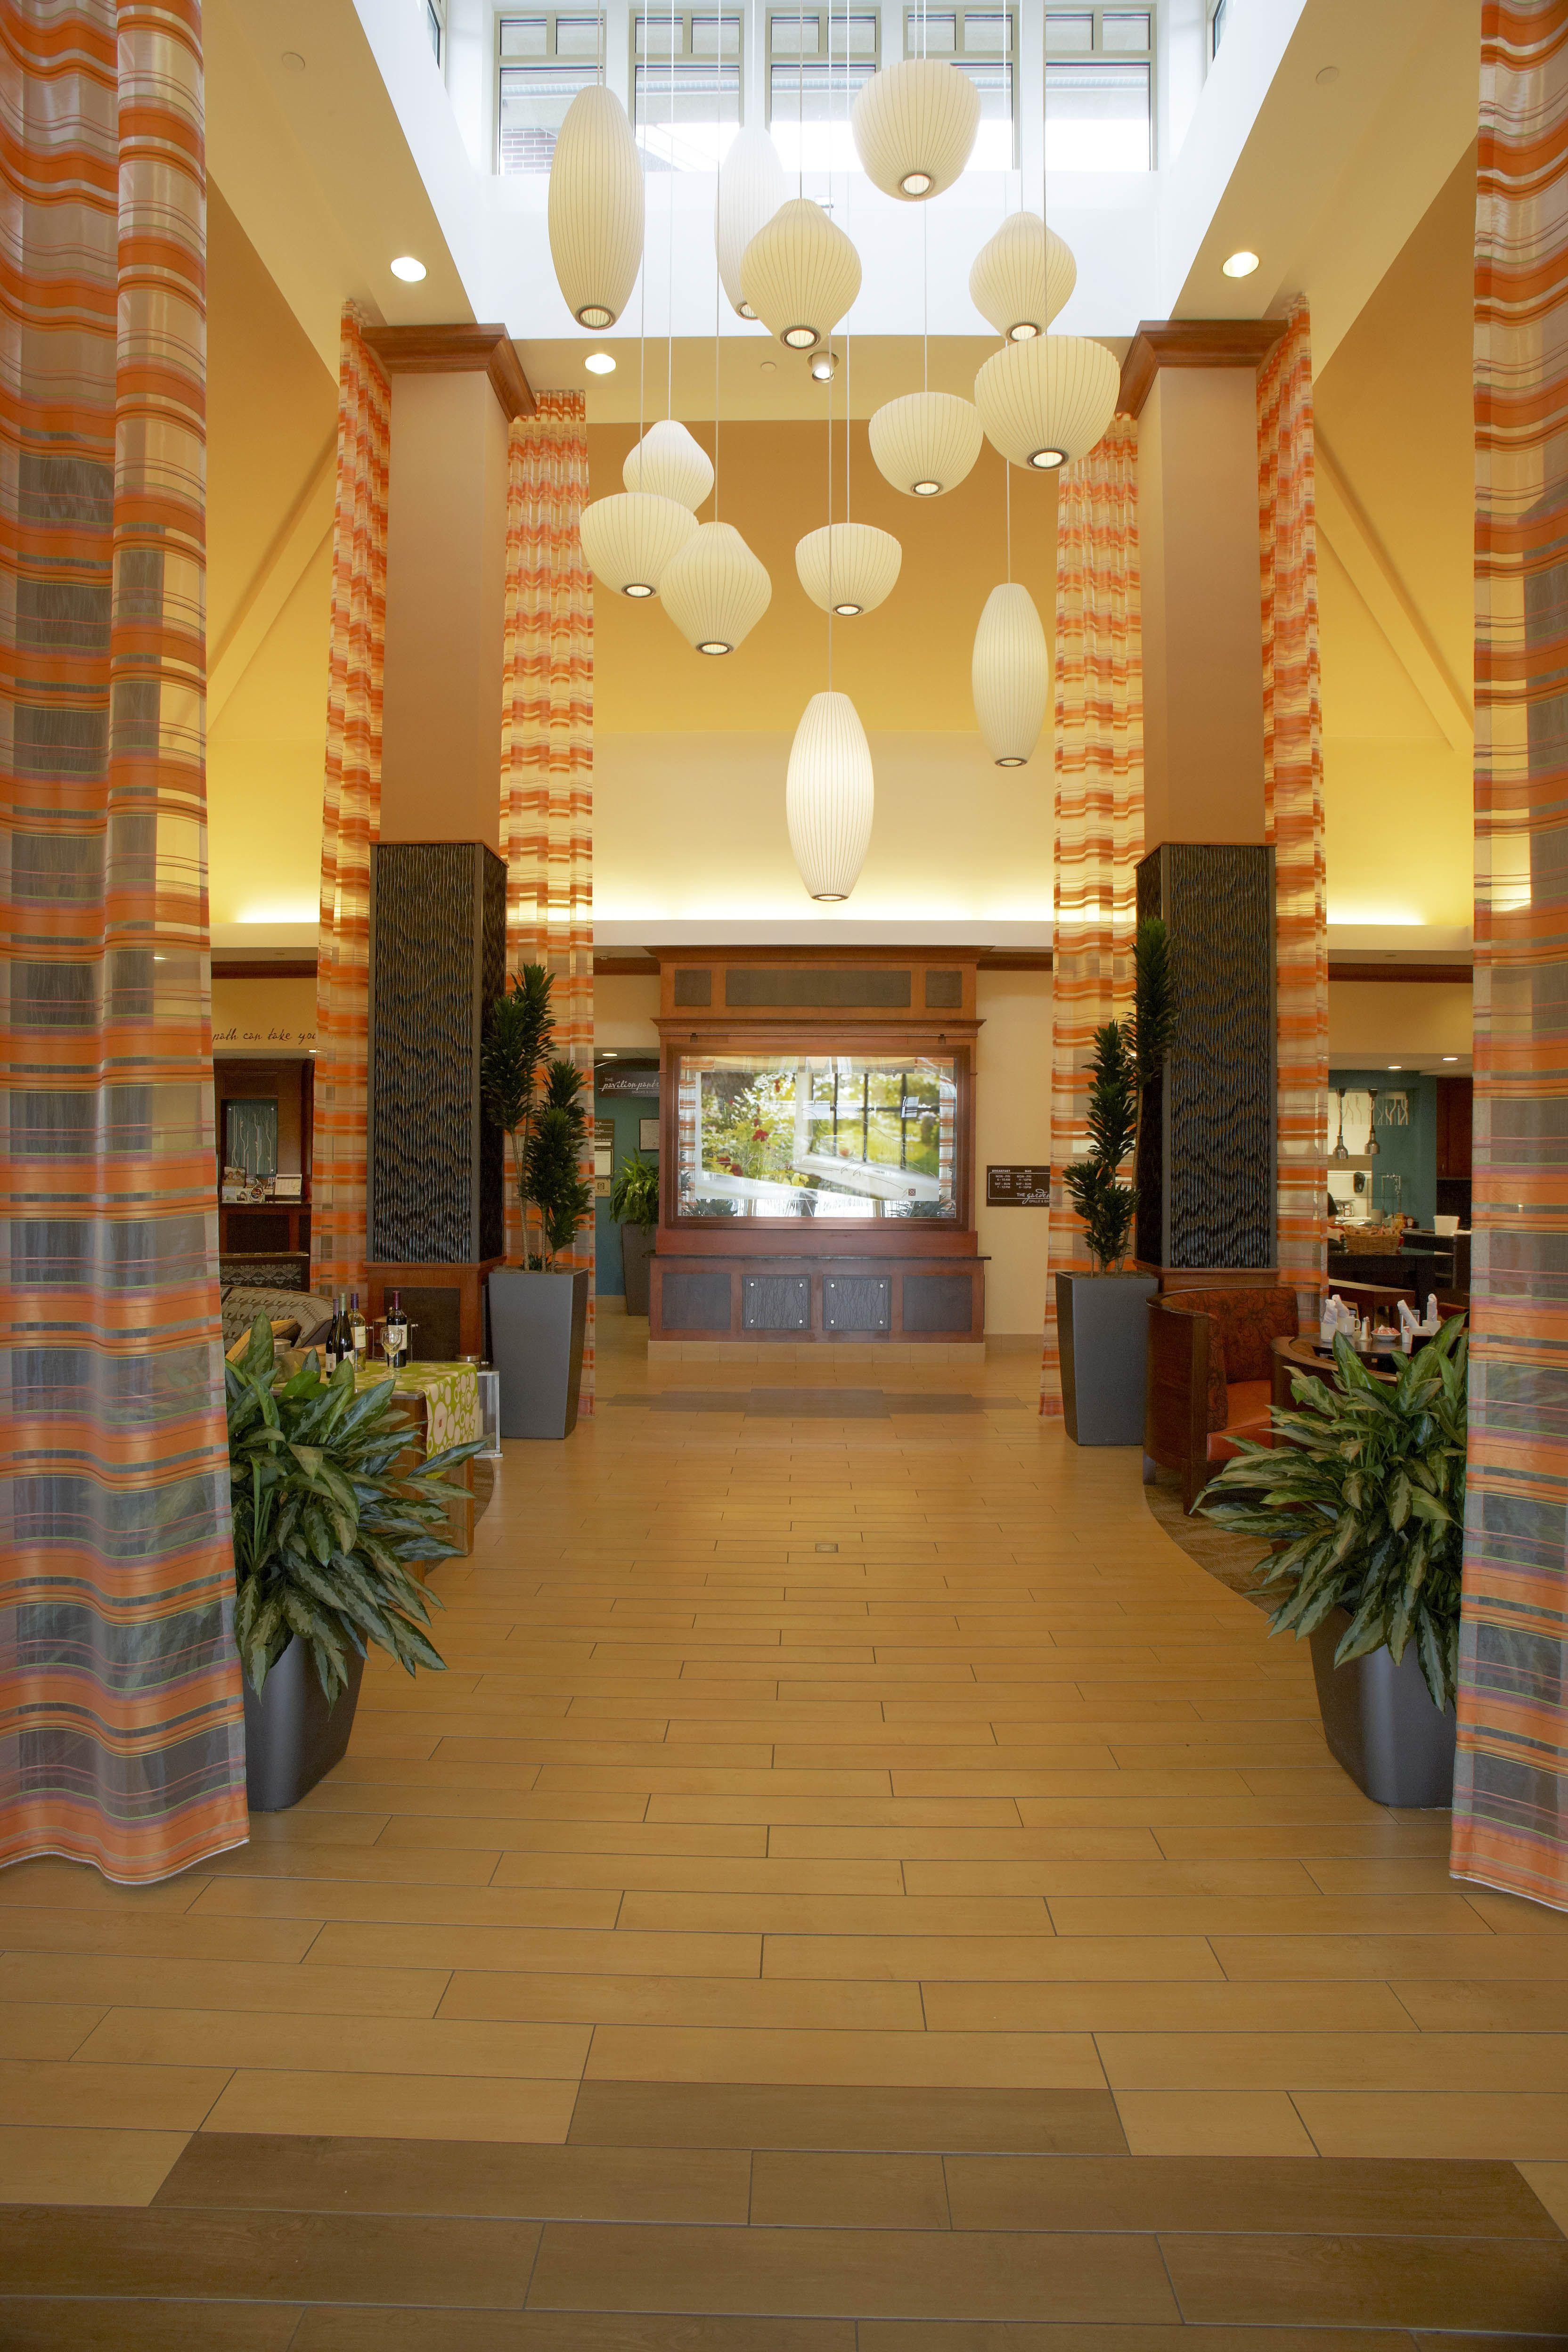 Hilton Garden Inn Madison West / Middleton | Be Our Guest | Pinterest